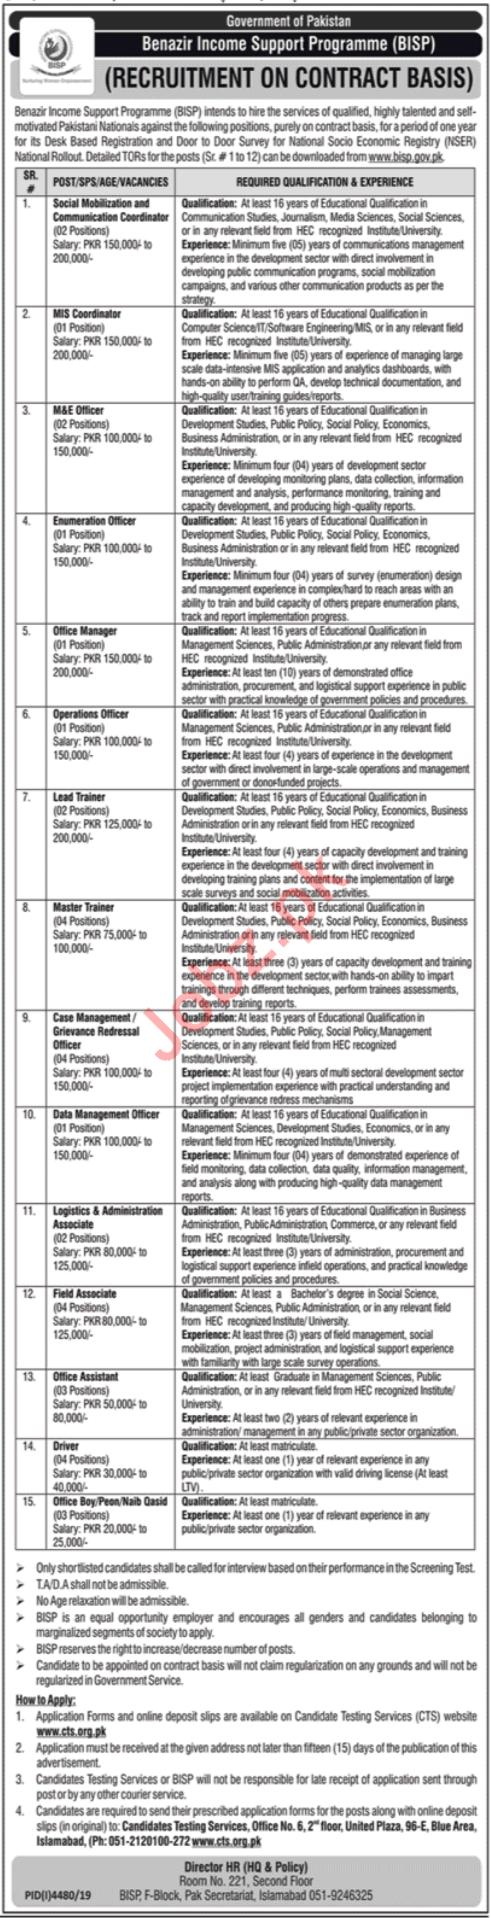 Benazir Income Support Programme BISP Jobs 2020 Via CTS